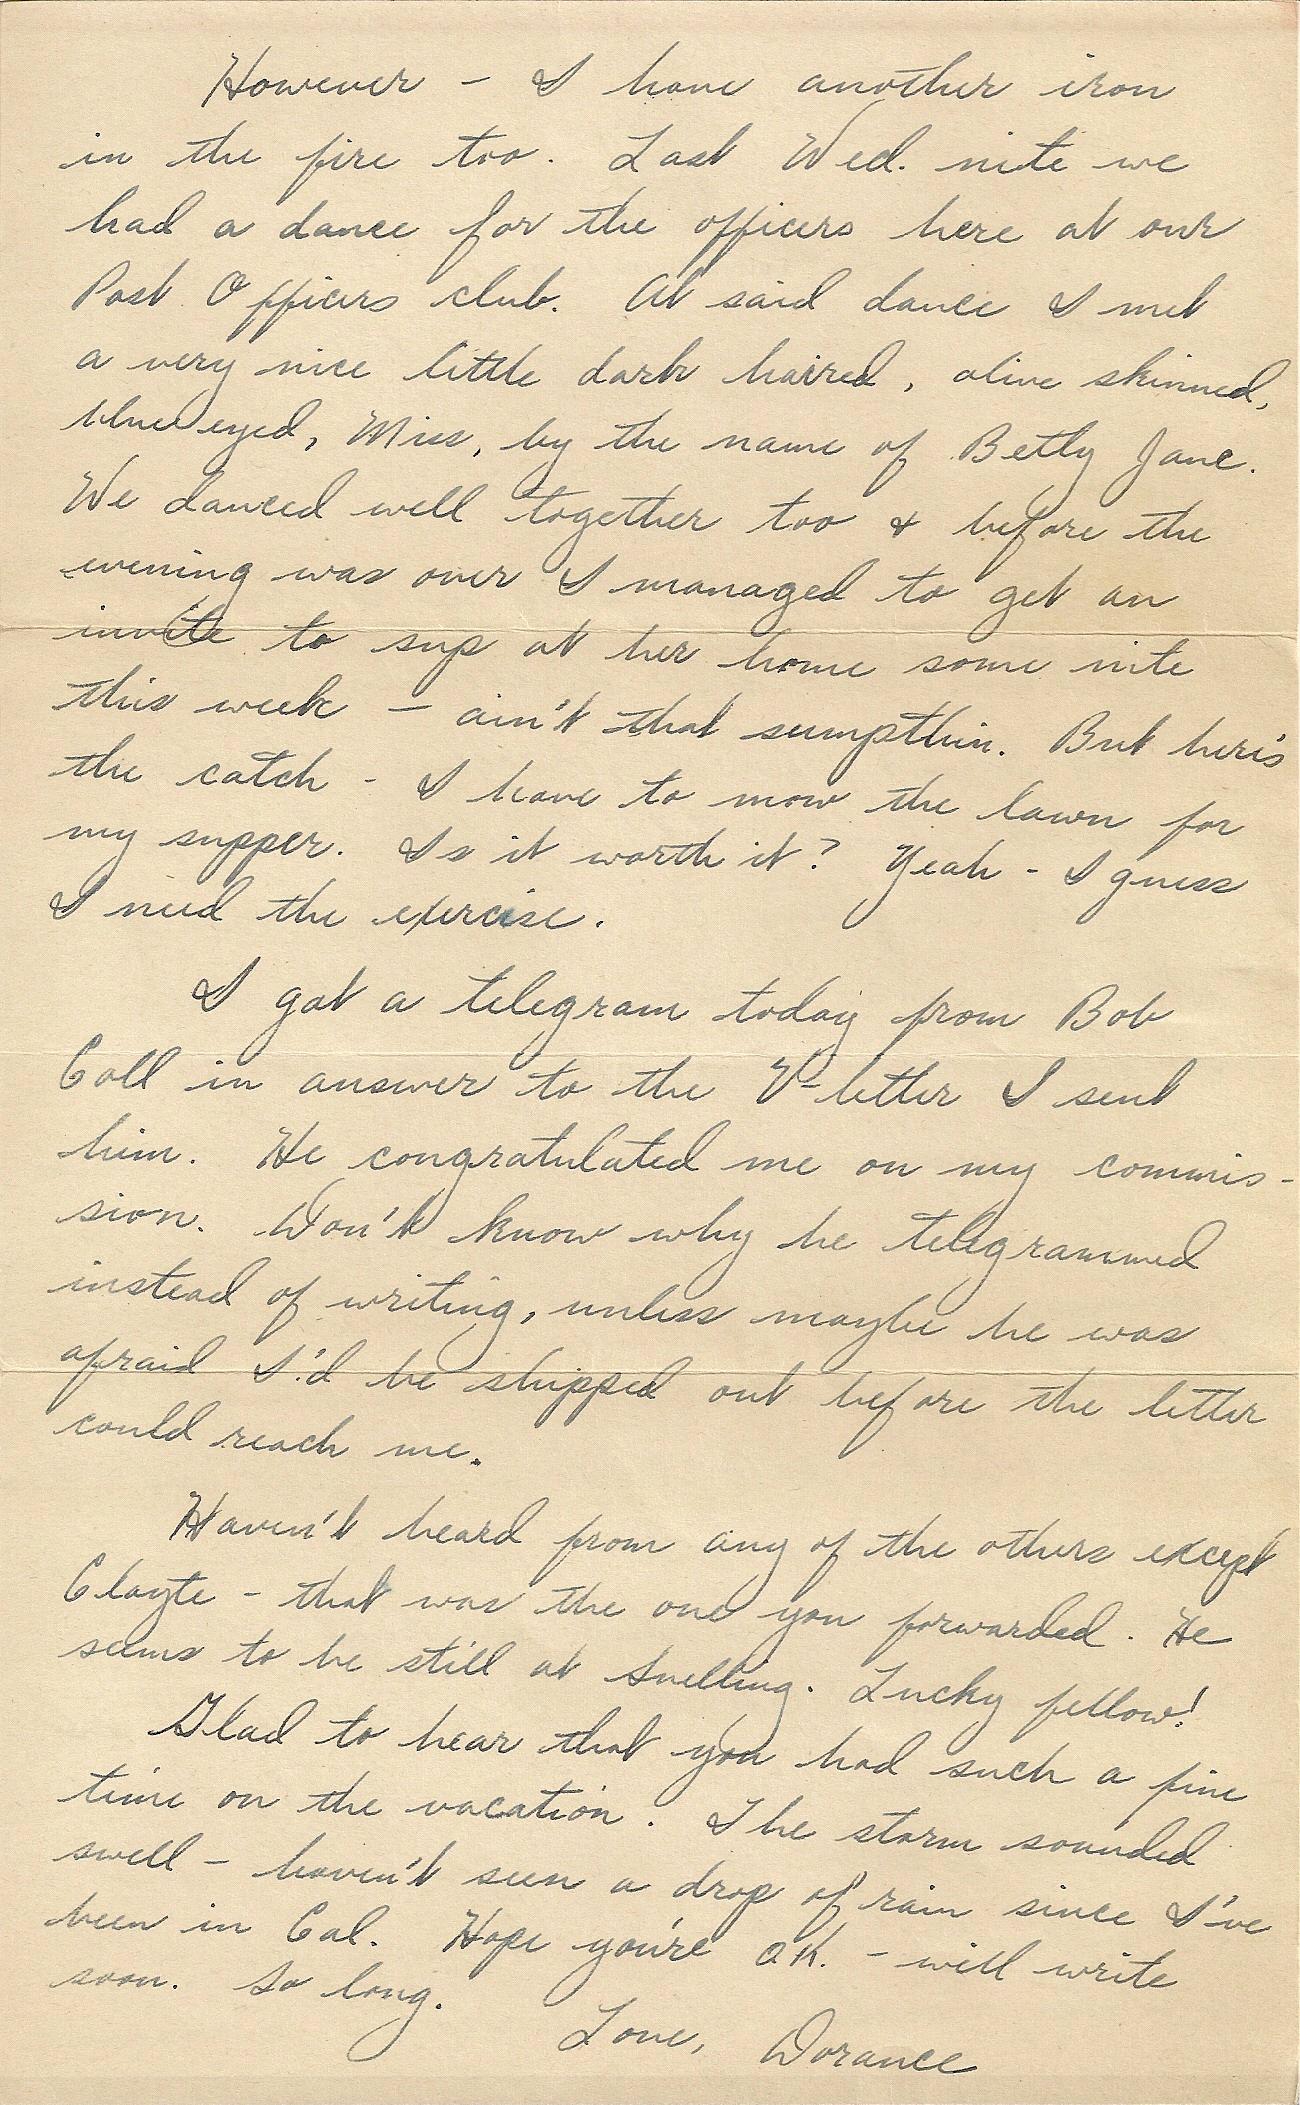 7.5.1943c.jpg